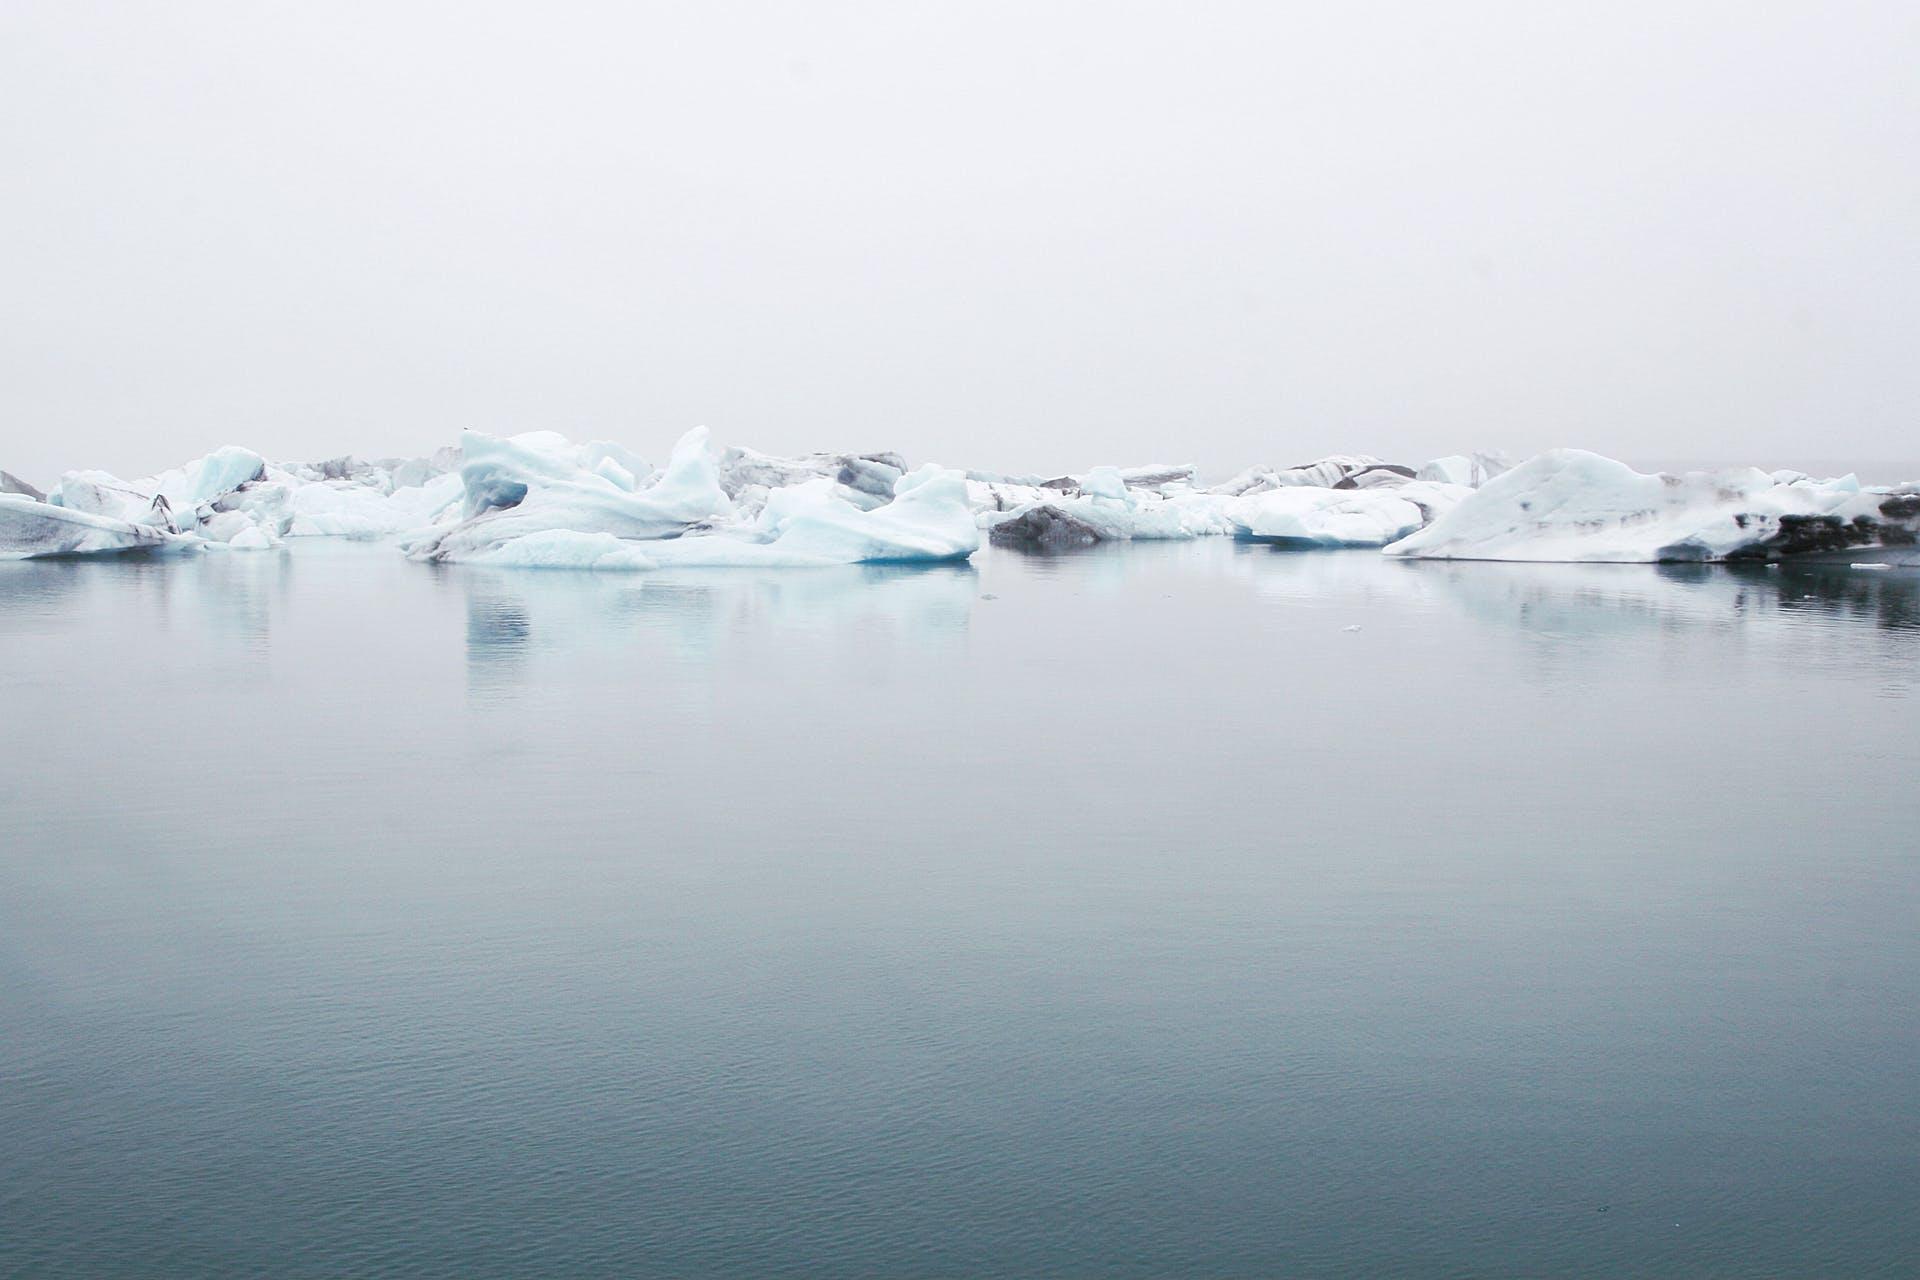 cold sea ice water ocean melting icebergs frozen